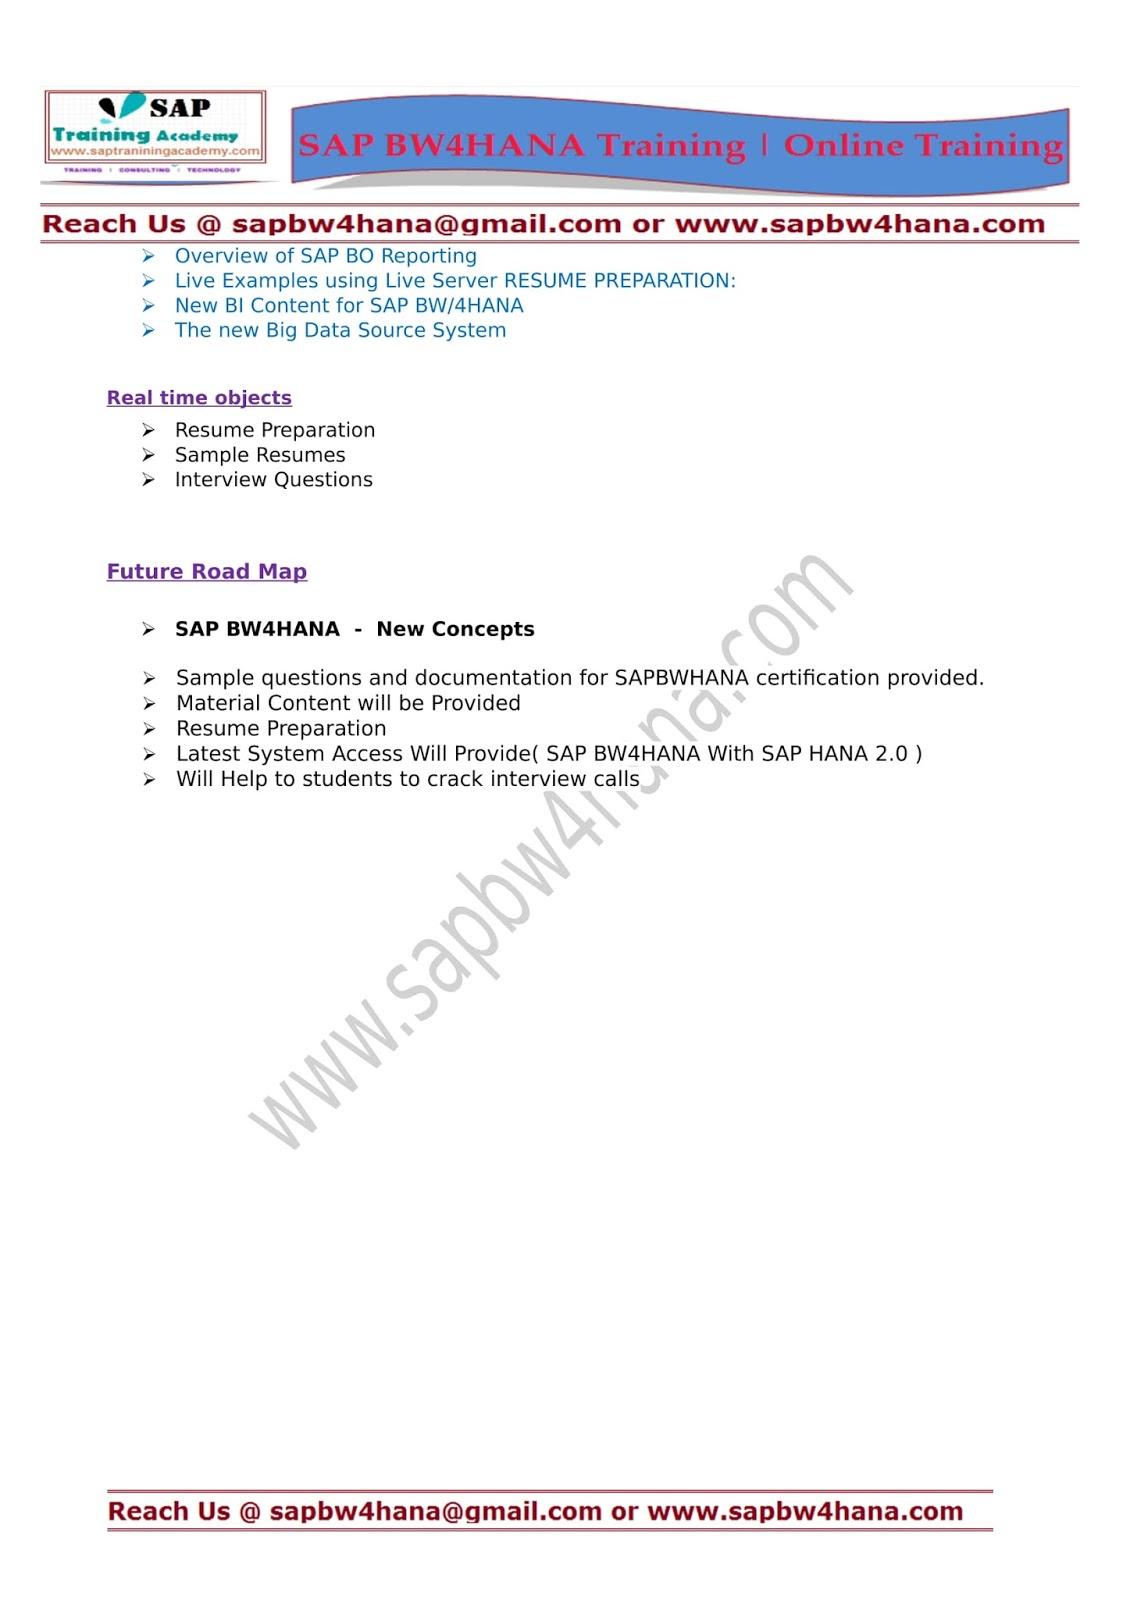 SAP BW4HANA Training   Certification   Online Training : SAP BW4HANA